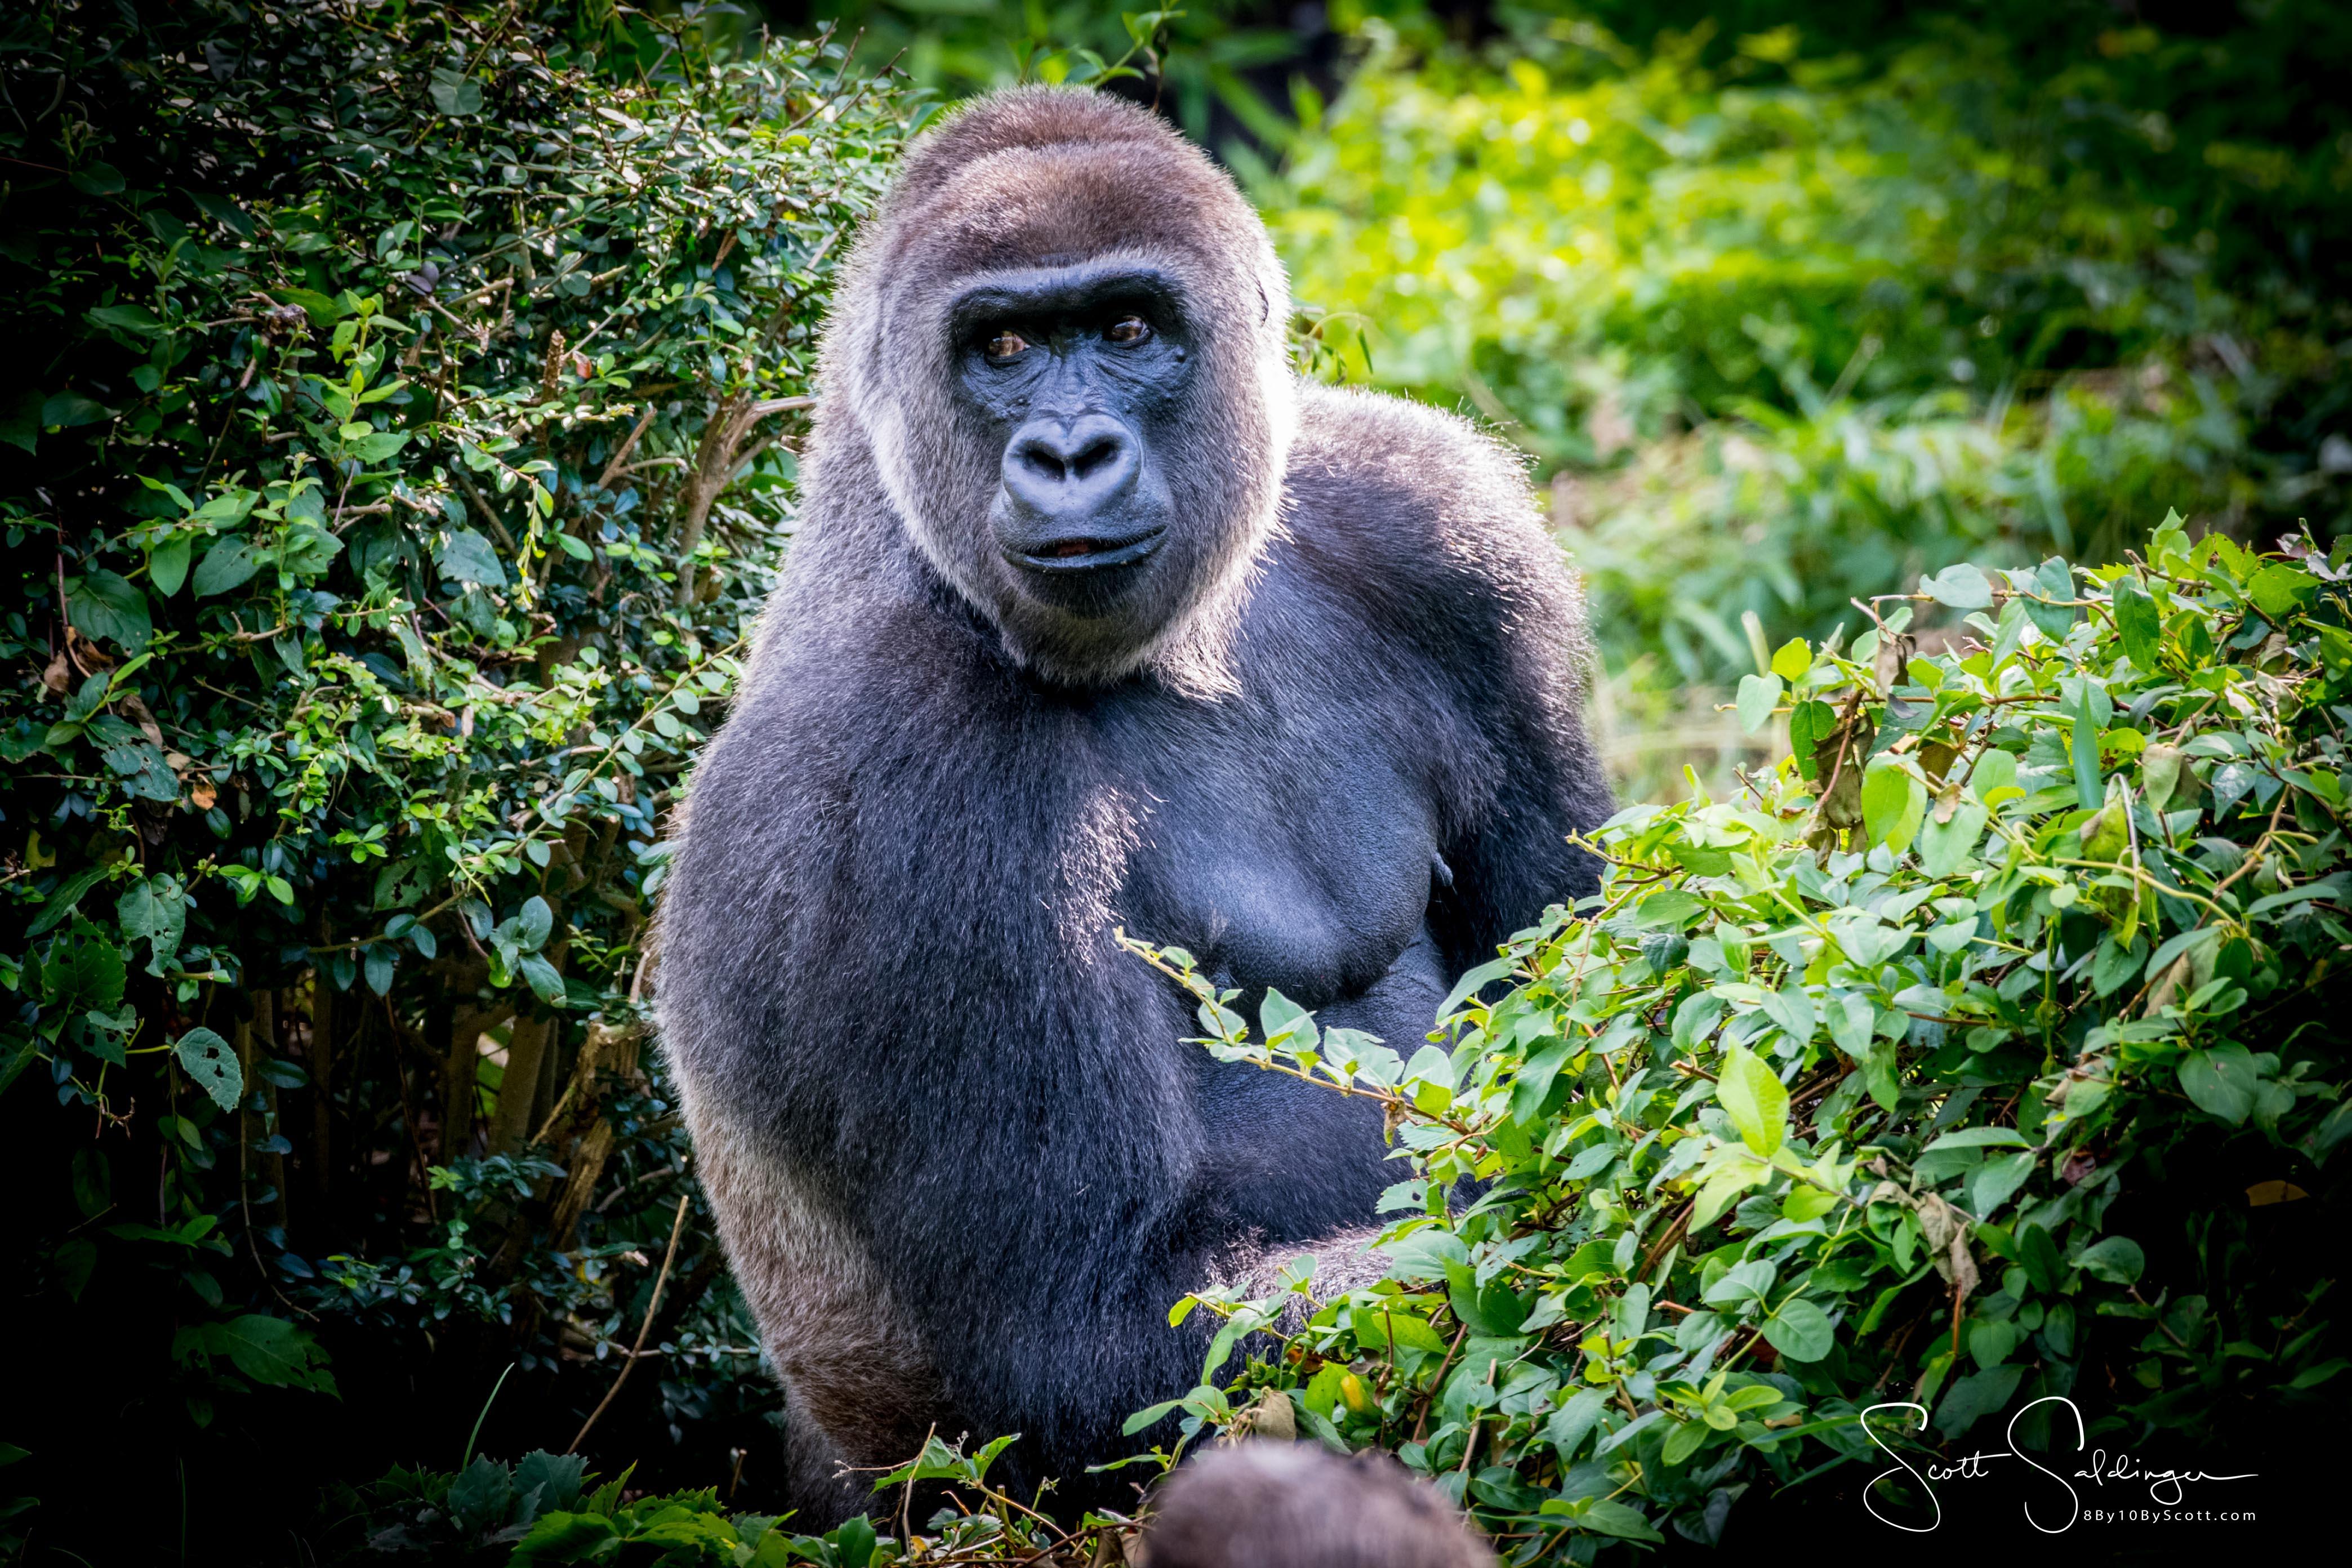 Apes-5600